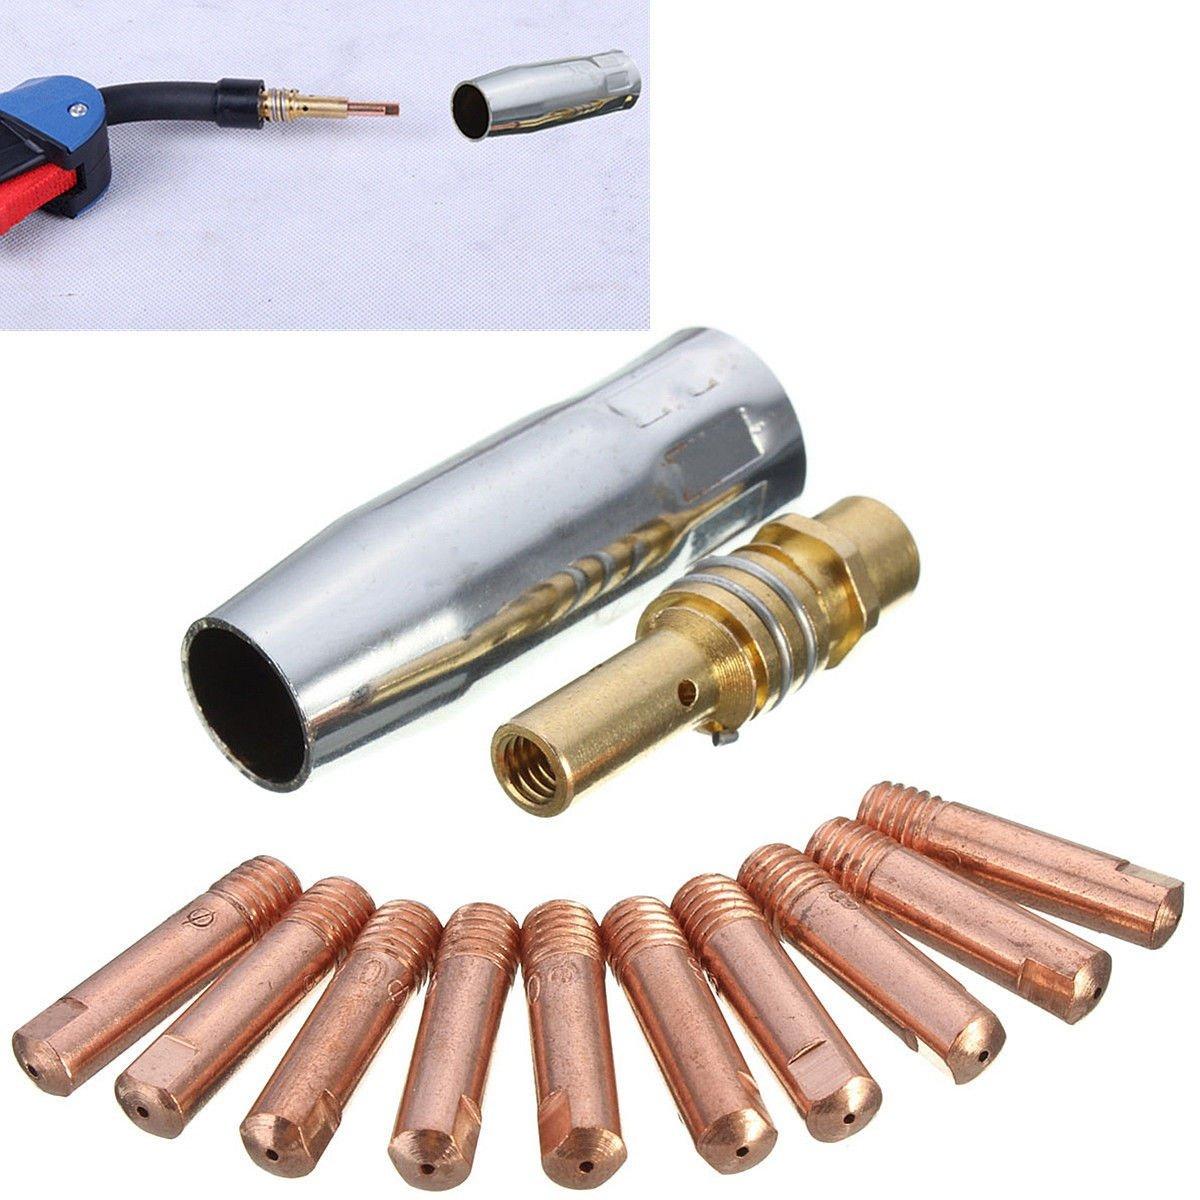 lzn nozzleshr Oud 12pcs MB 15 AK Mig/Mag Soldadura Contacto Consejos 0.8 x 25 mm M6 gas boquilla Tip plana Gas Protegidas sudor Grabadora accesorios: ...